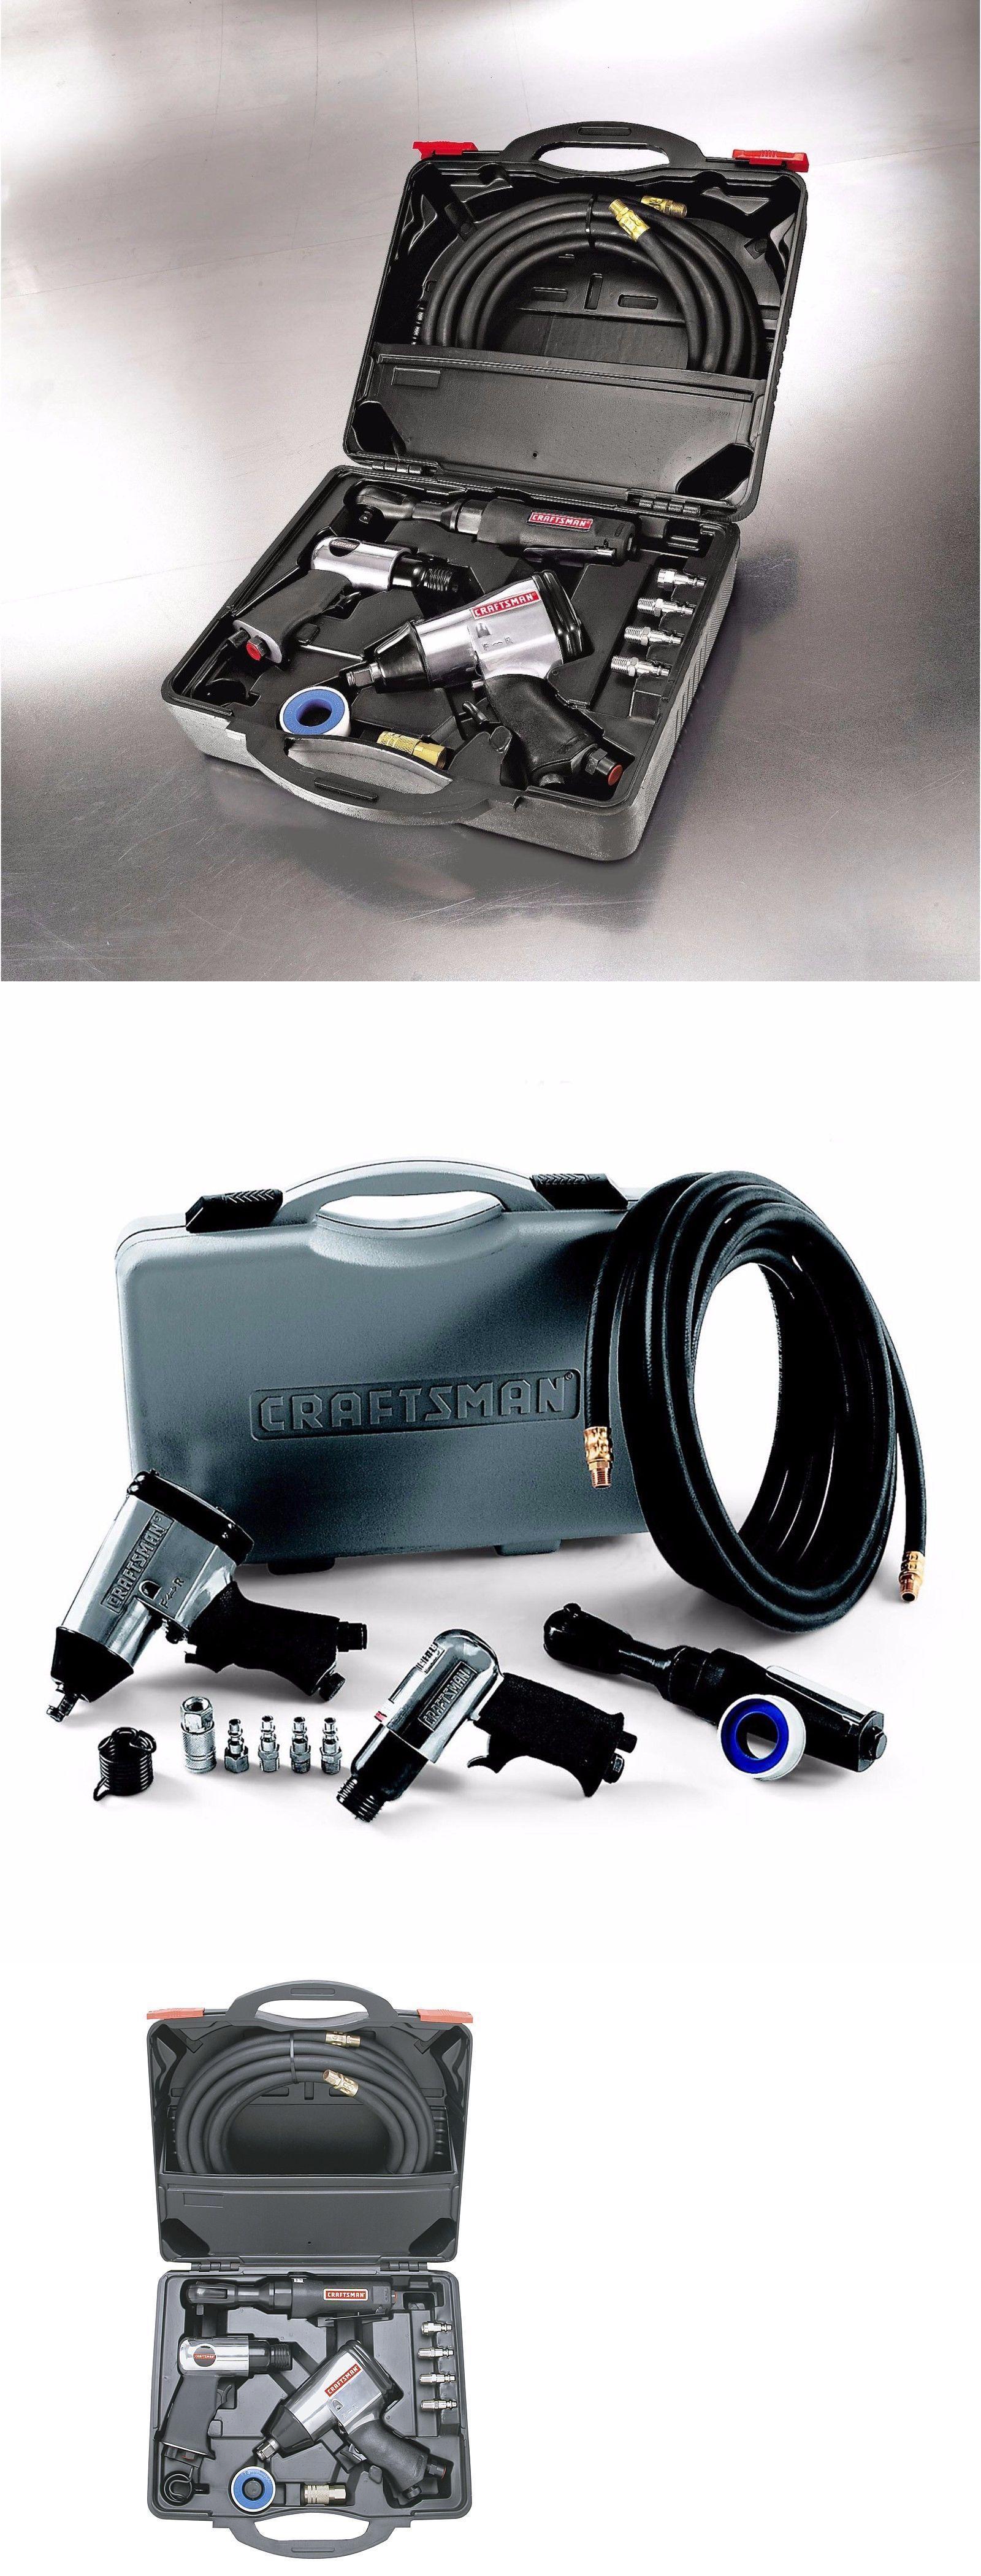 Craftsman 14 pc. Mechanics Air Tool Kit Tools Air